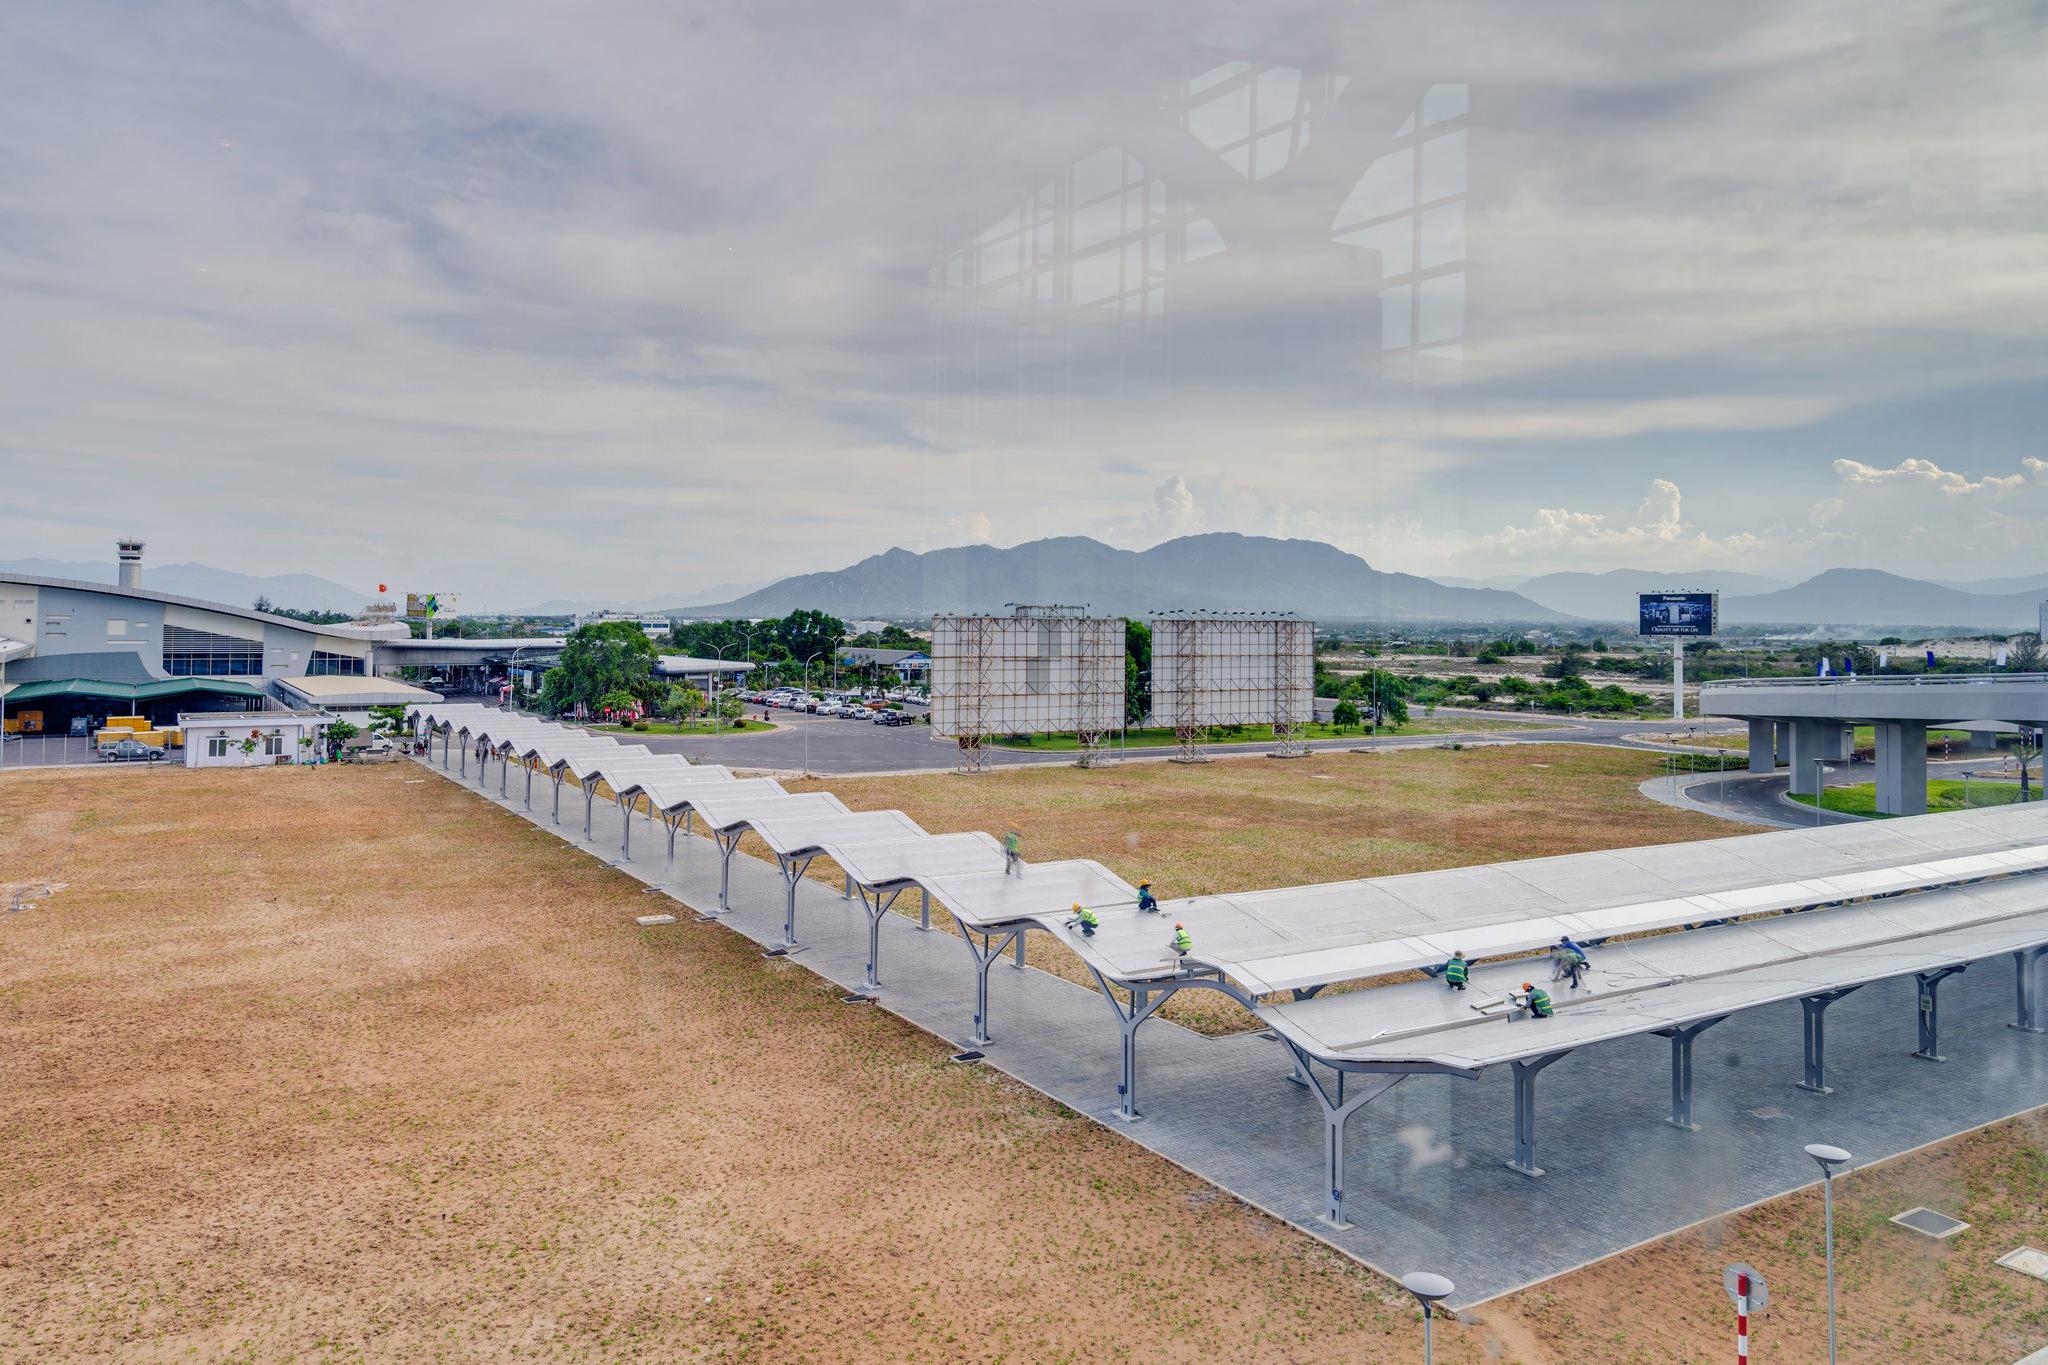 20180626 - Cam Ranh Airport - Architecture - 0347.jpg